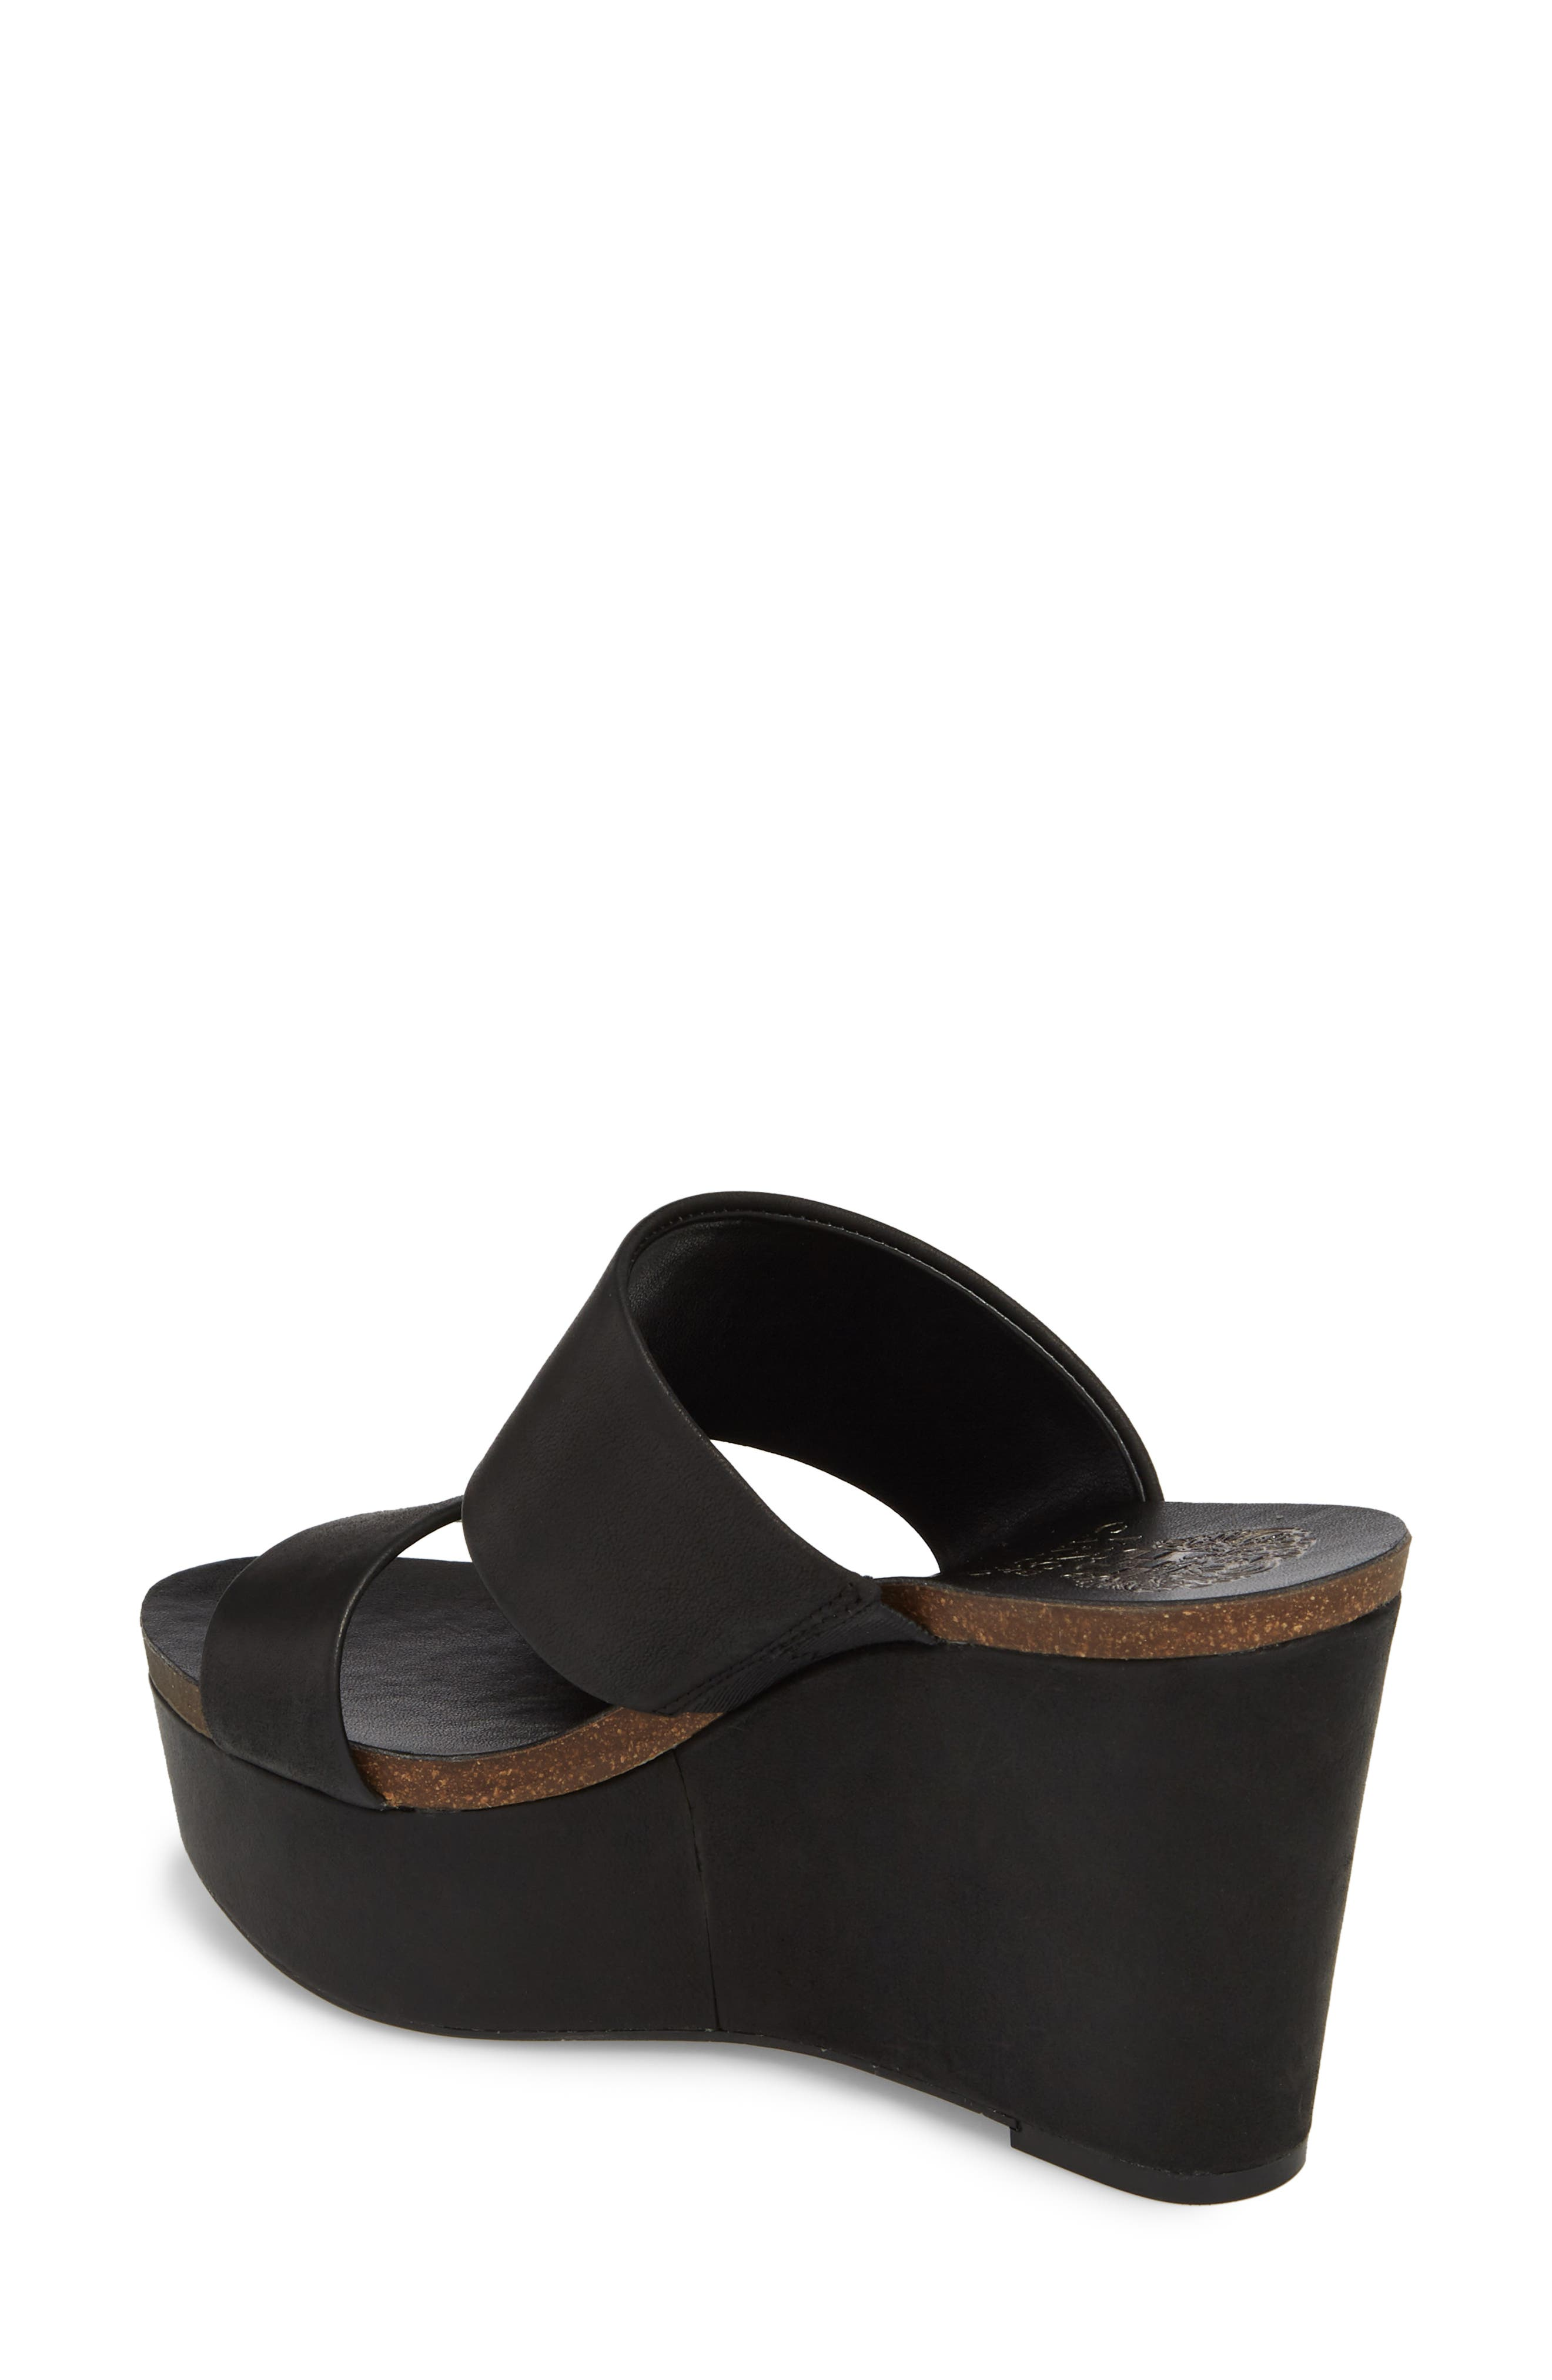 Varenia Platform Wedge Sandal,                             Alternate thumbnail 2, color,                             001